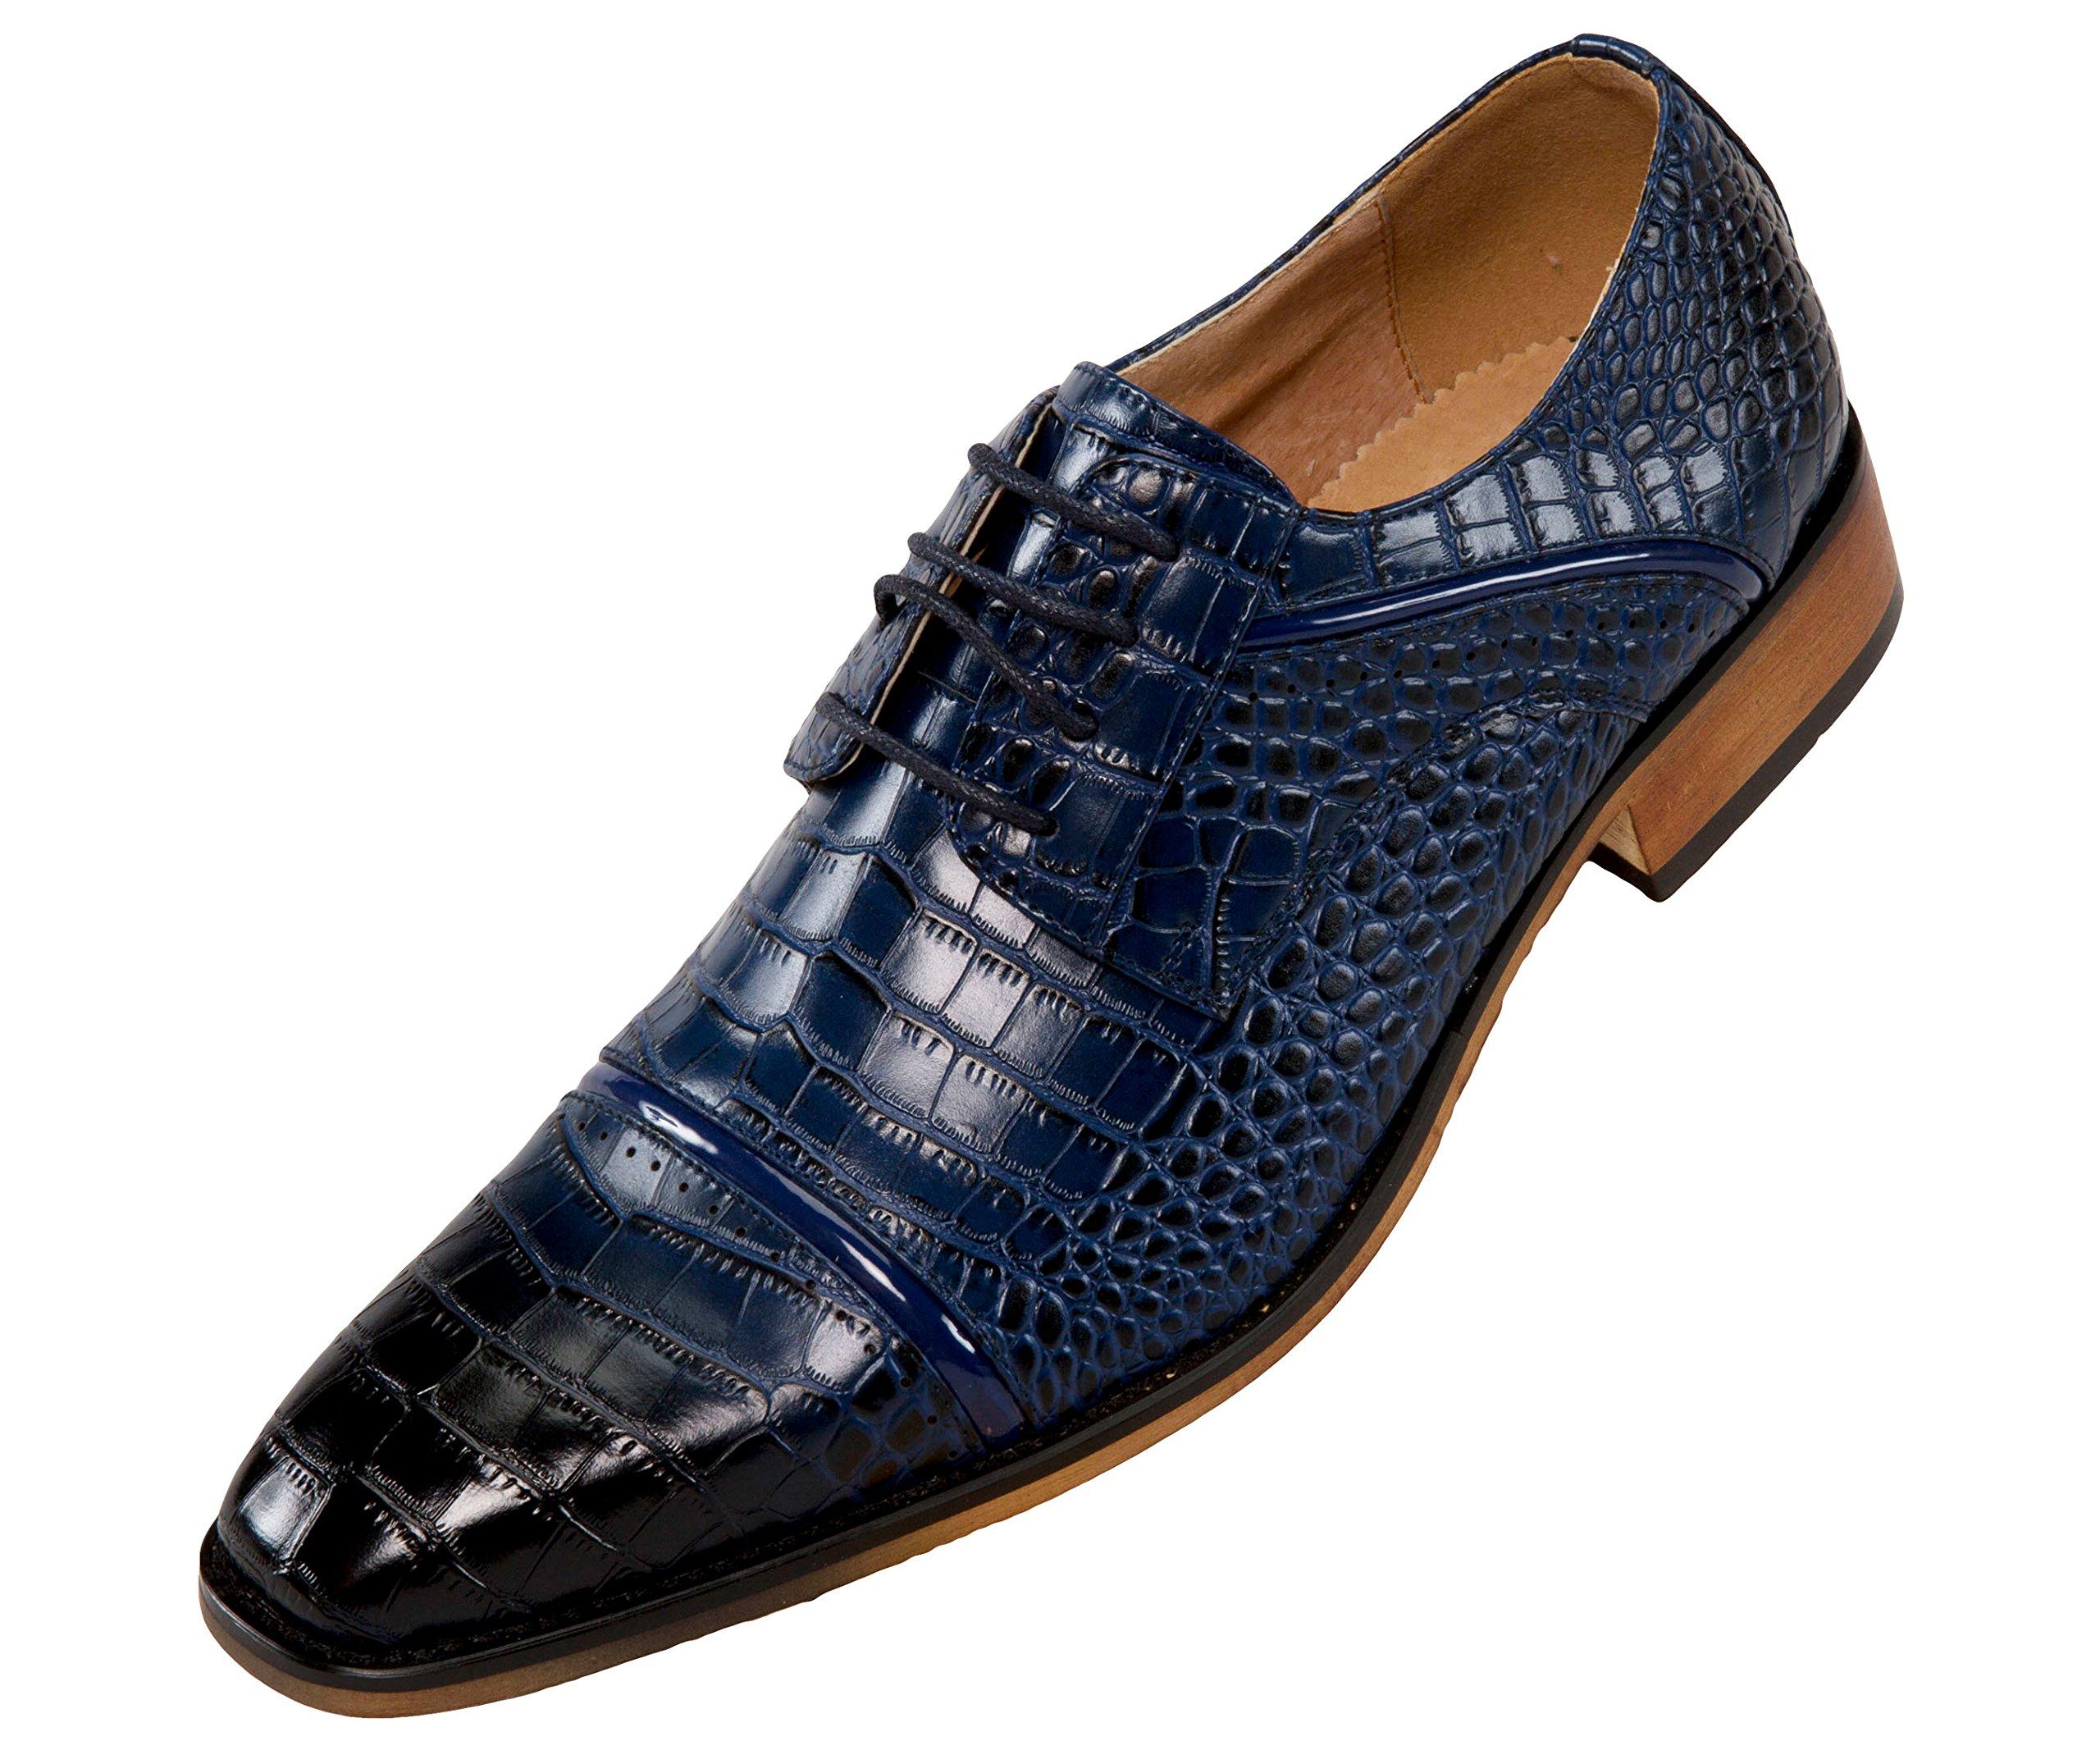 Amali Mens Oxford Dress Shoes Zig Zag Stitching Exotic Crocodile Designs Styles Tomaso, Eberly